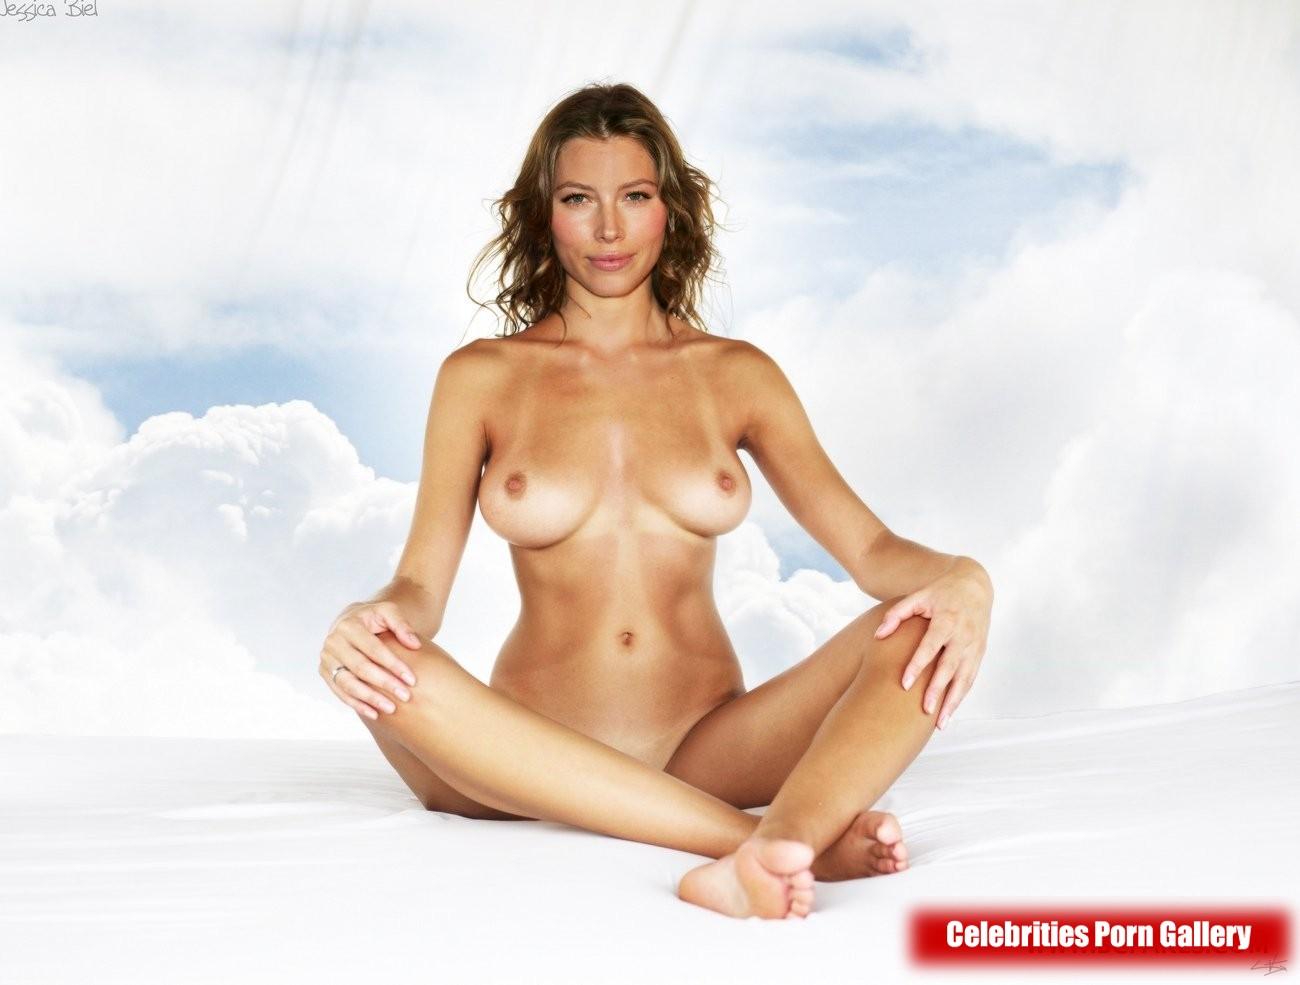 Jessica biel full body nude shots